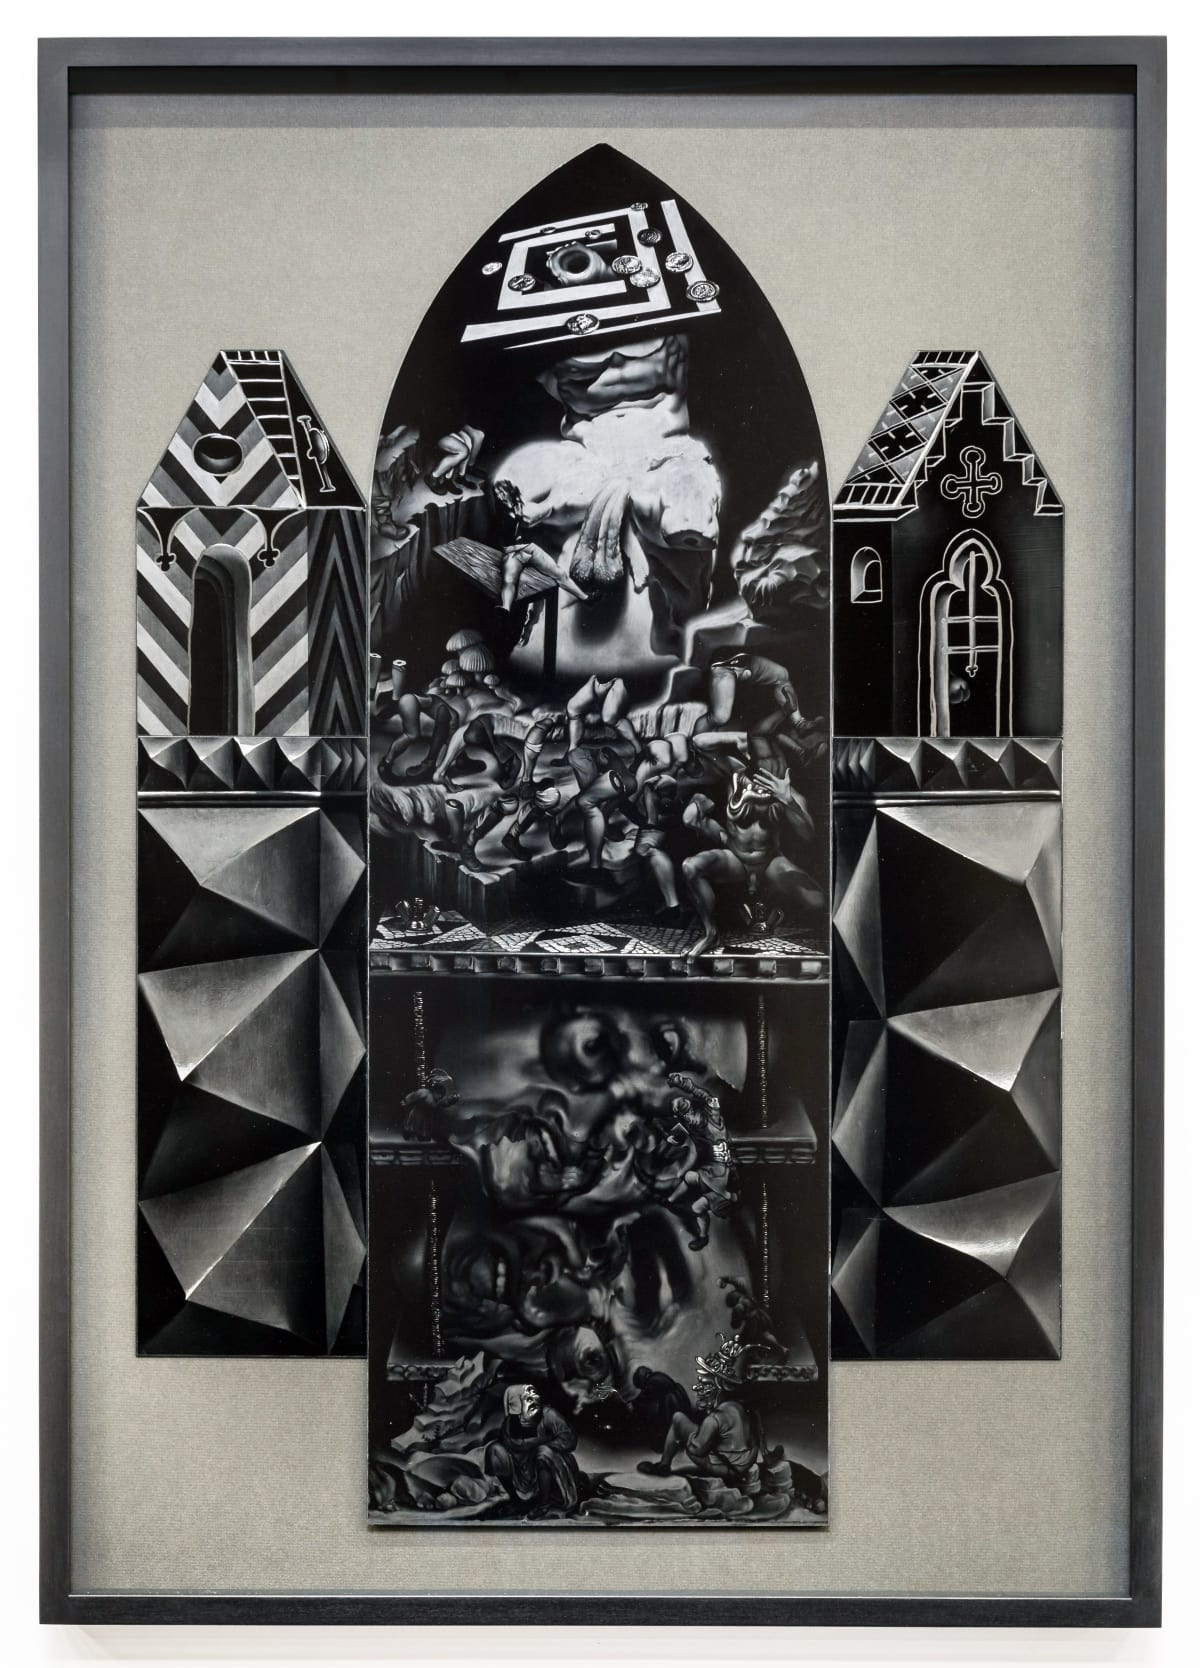 Robert McNally  Peristalsis of weak and feeble, 2016  Graphite on ultra-black carbon nanotube coated aluminium  102 x 72 cm  40 1/8 x 28 3/8 in  (Framed)  Courtesy of David Risley gallery Copenhagen